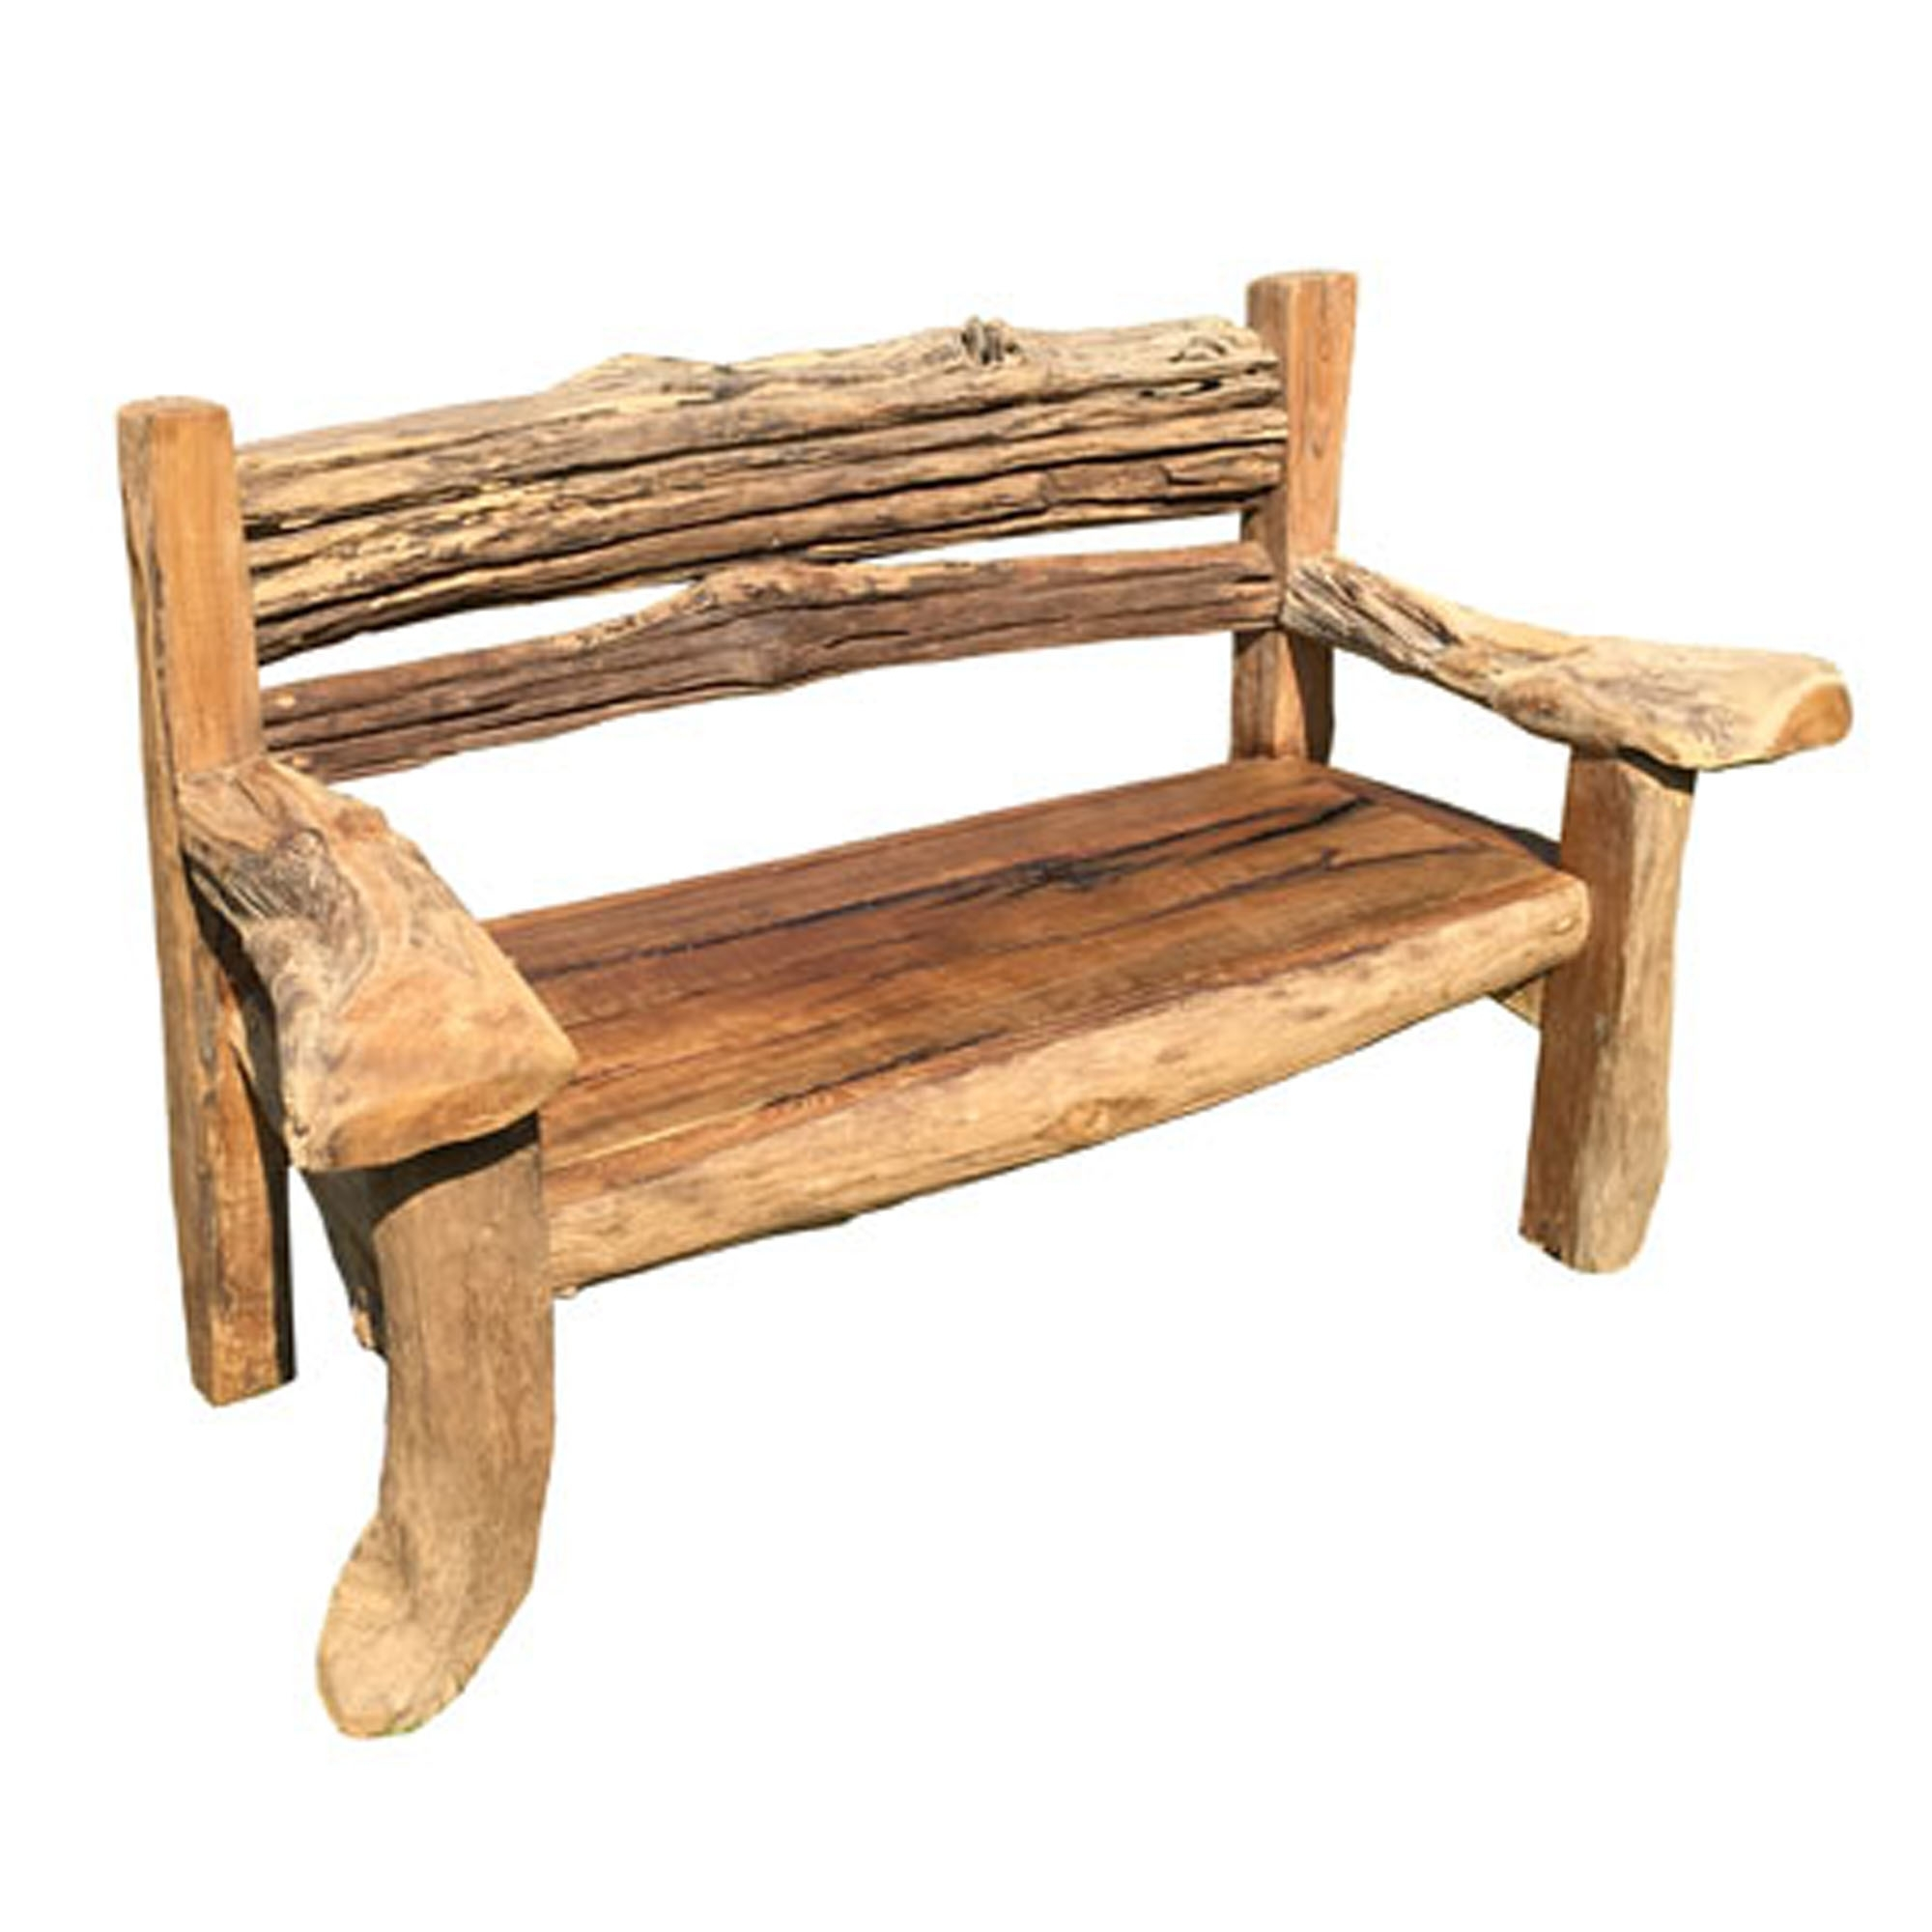 Phenomenal Teak Root Bench Rustic Garden Squirreltailoven Fun Painted Chair Ideas Images Squirreltailovenorg